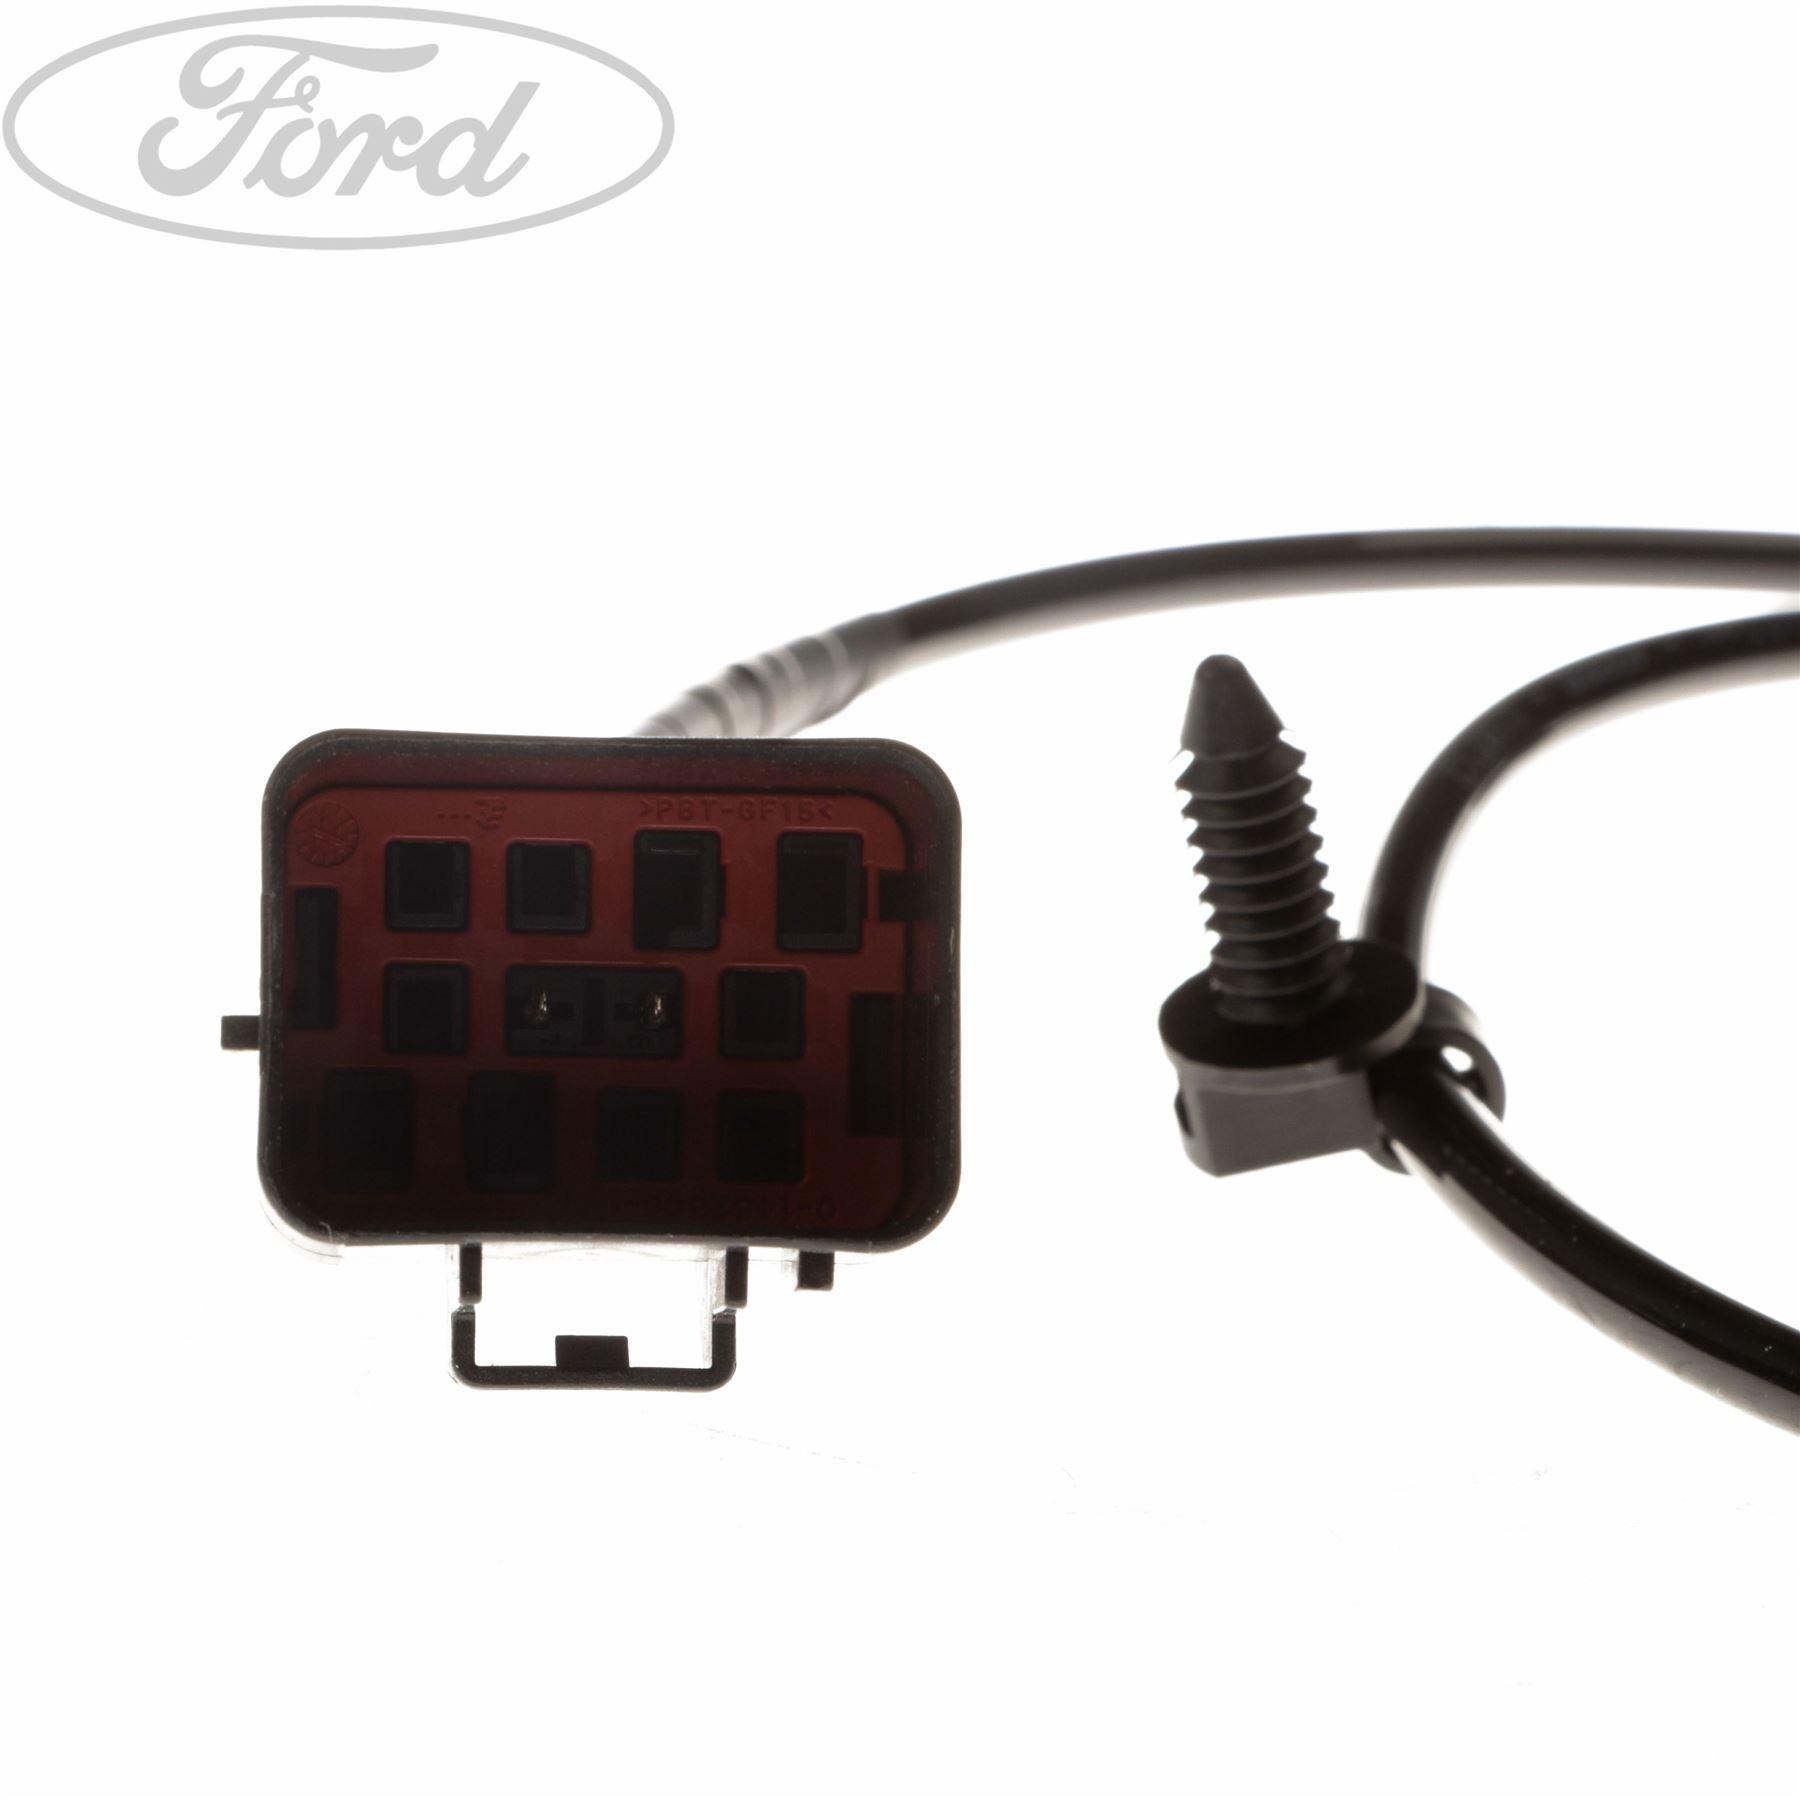 Genuine Ford Abs Brake Skid Control Wiring 1599864 Ebay Adapter